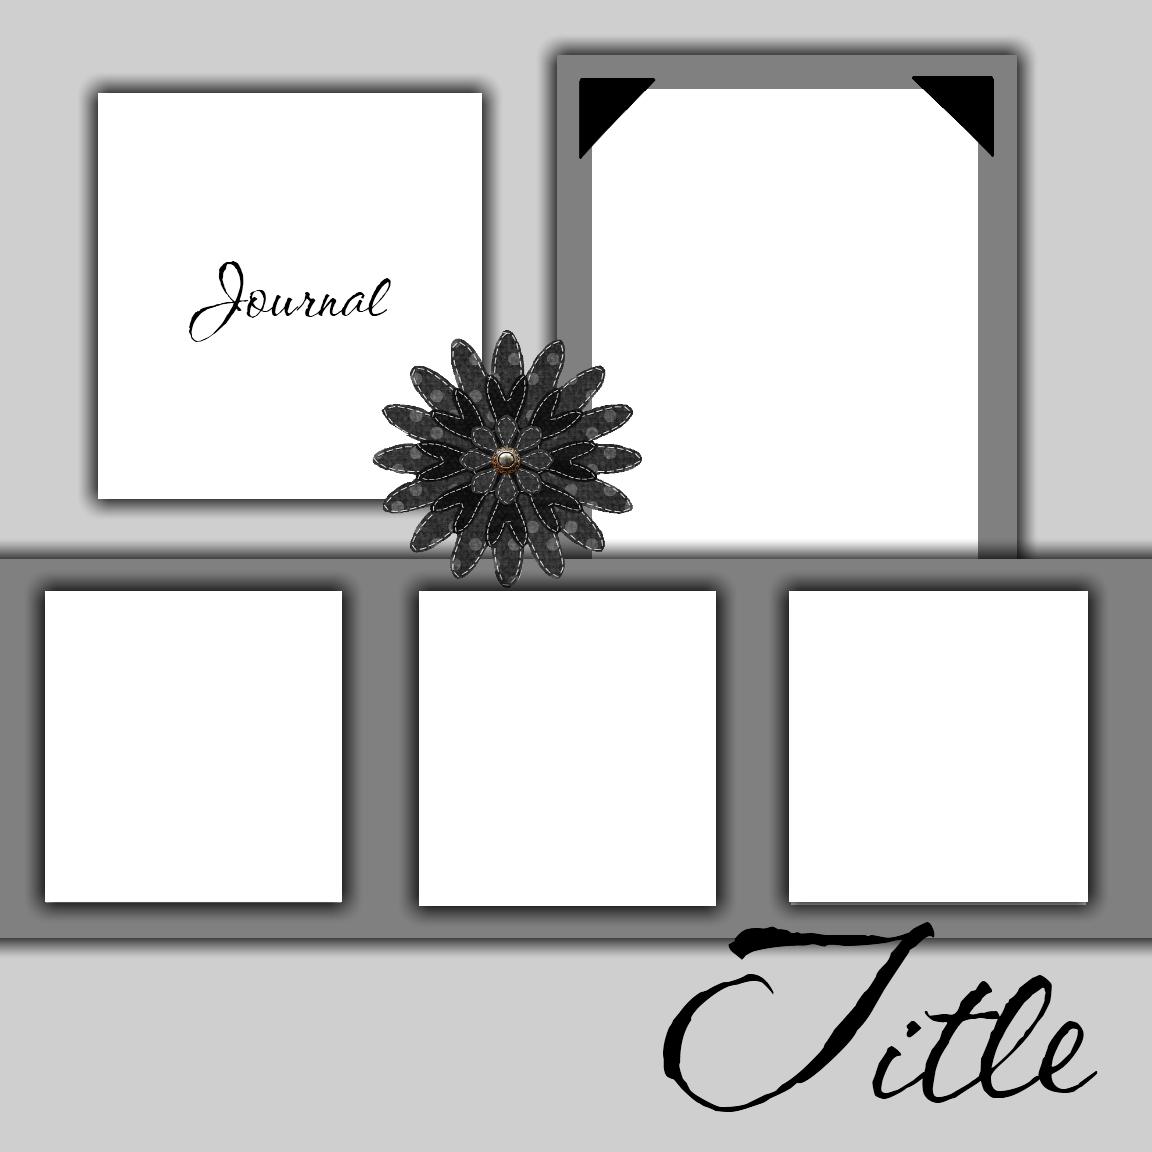 Free Printable Scrapbook Layout Templates | Free Scrapbook Templates - Free Printable Scrapbook Pages